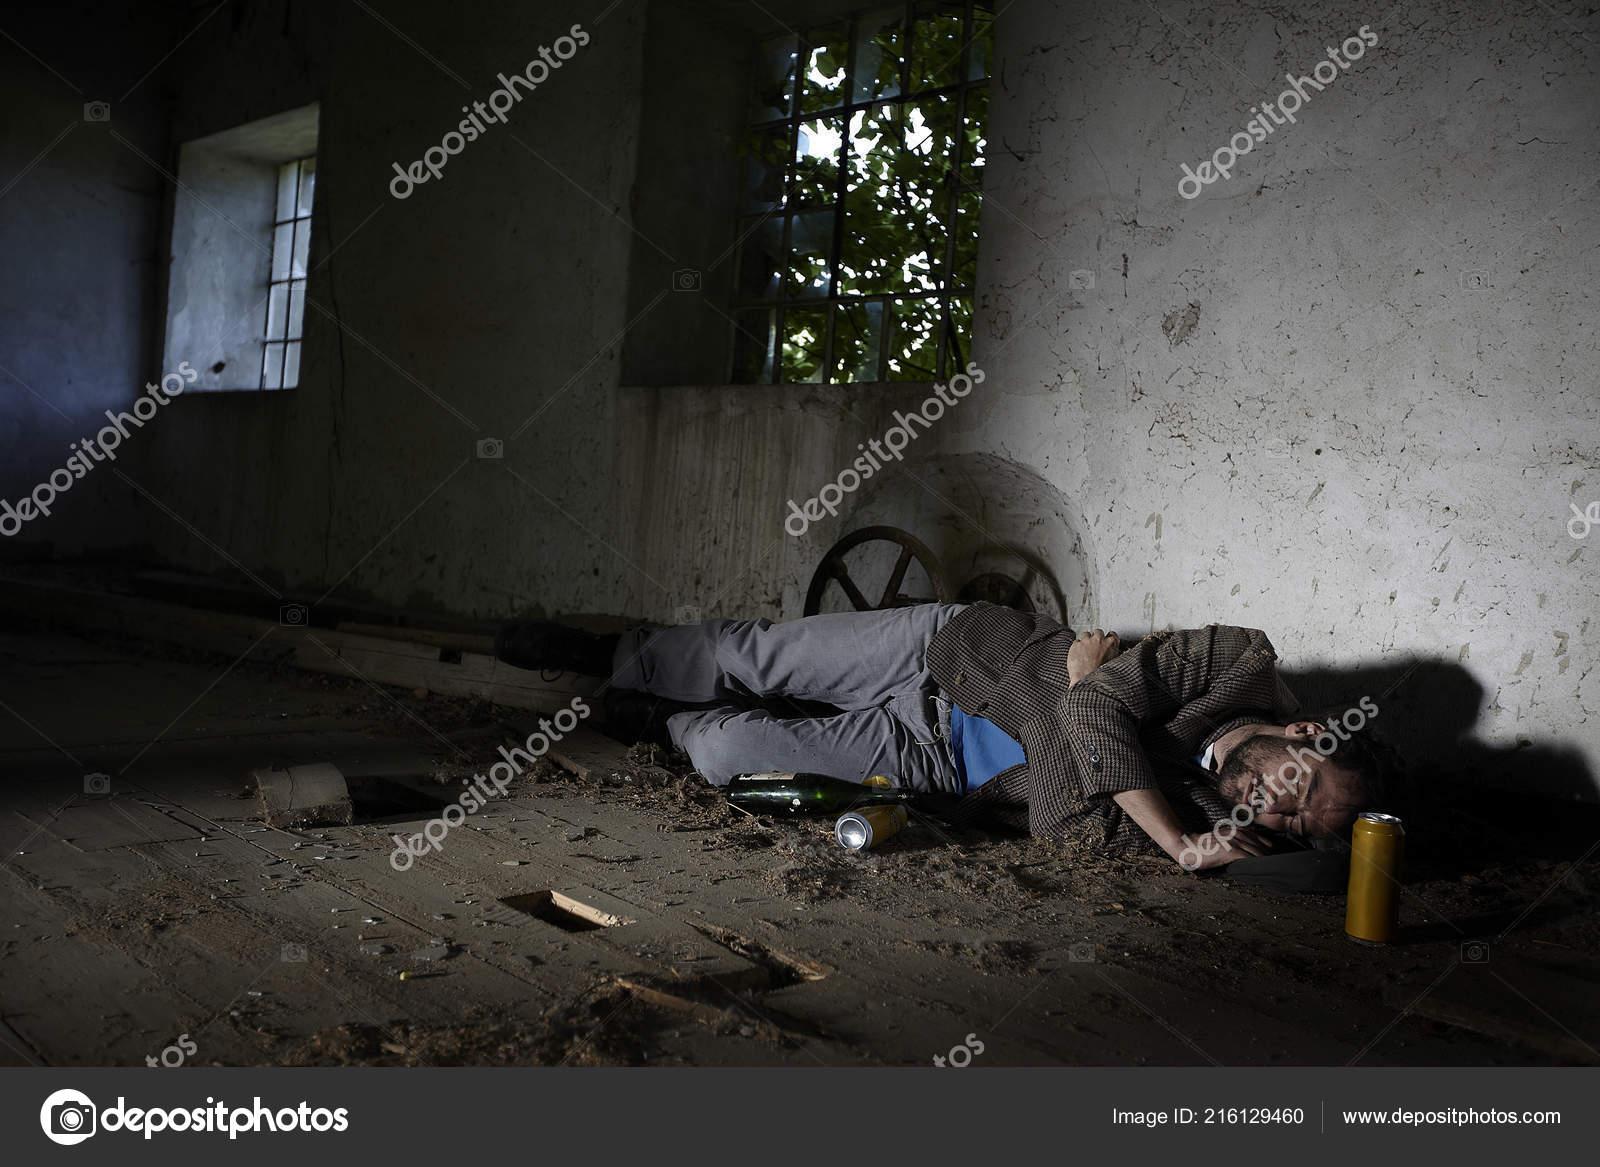 Drunk Homeless Man Sleeping Floor Beer Cans Abandoned Building Stock Photo C Epiximages 216129460